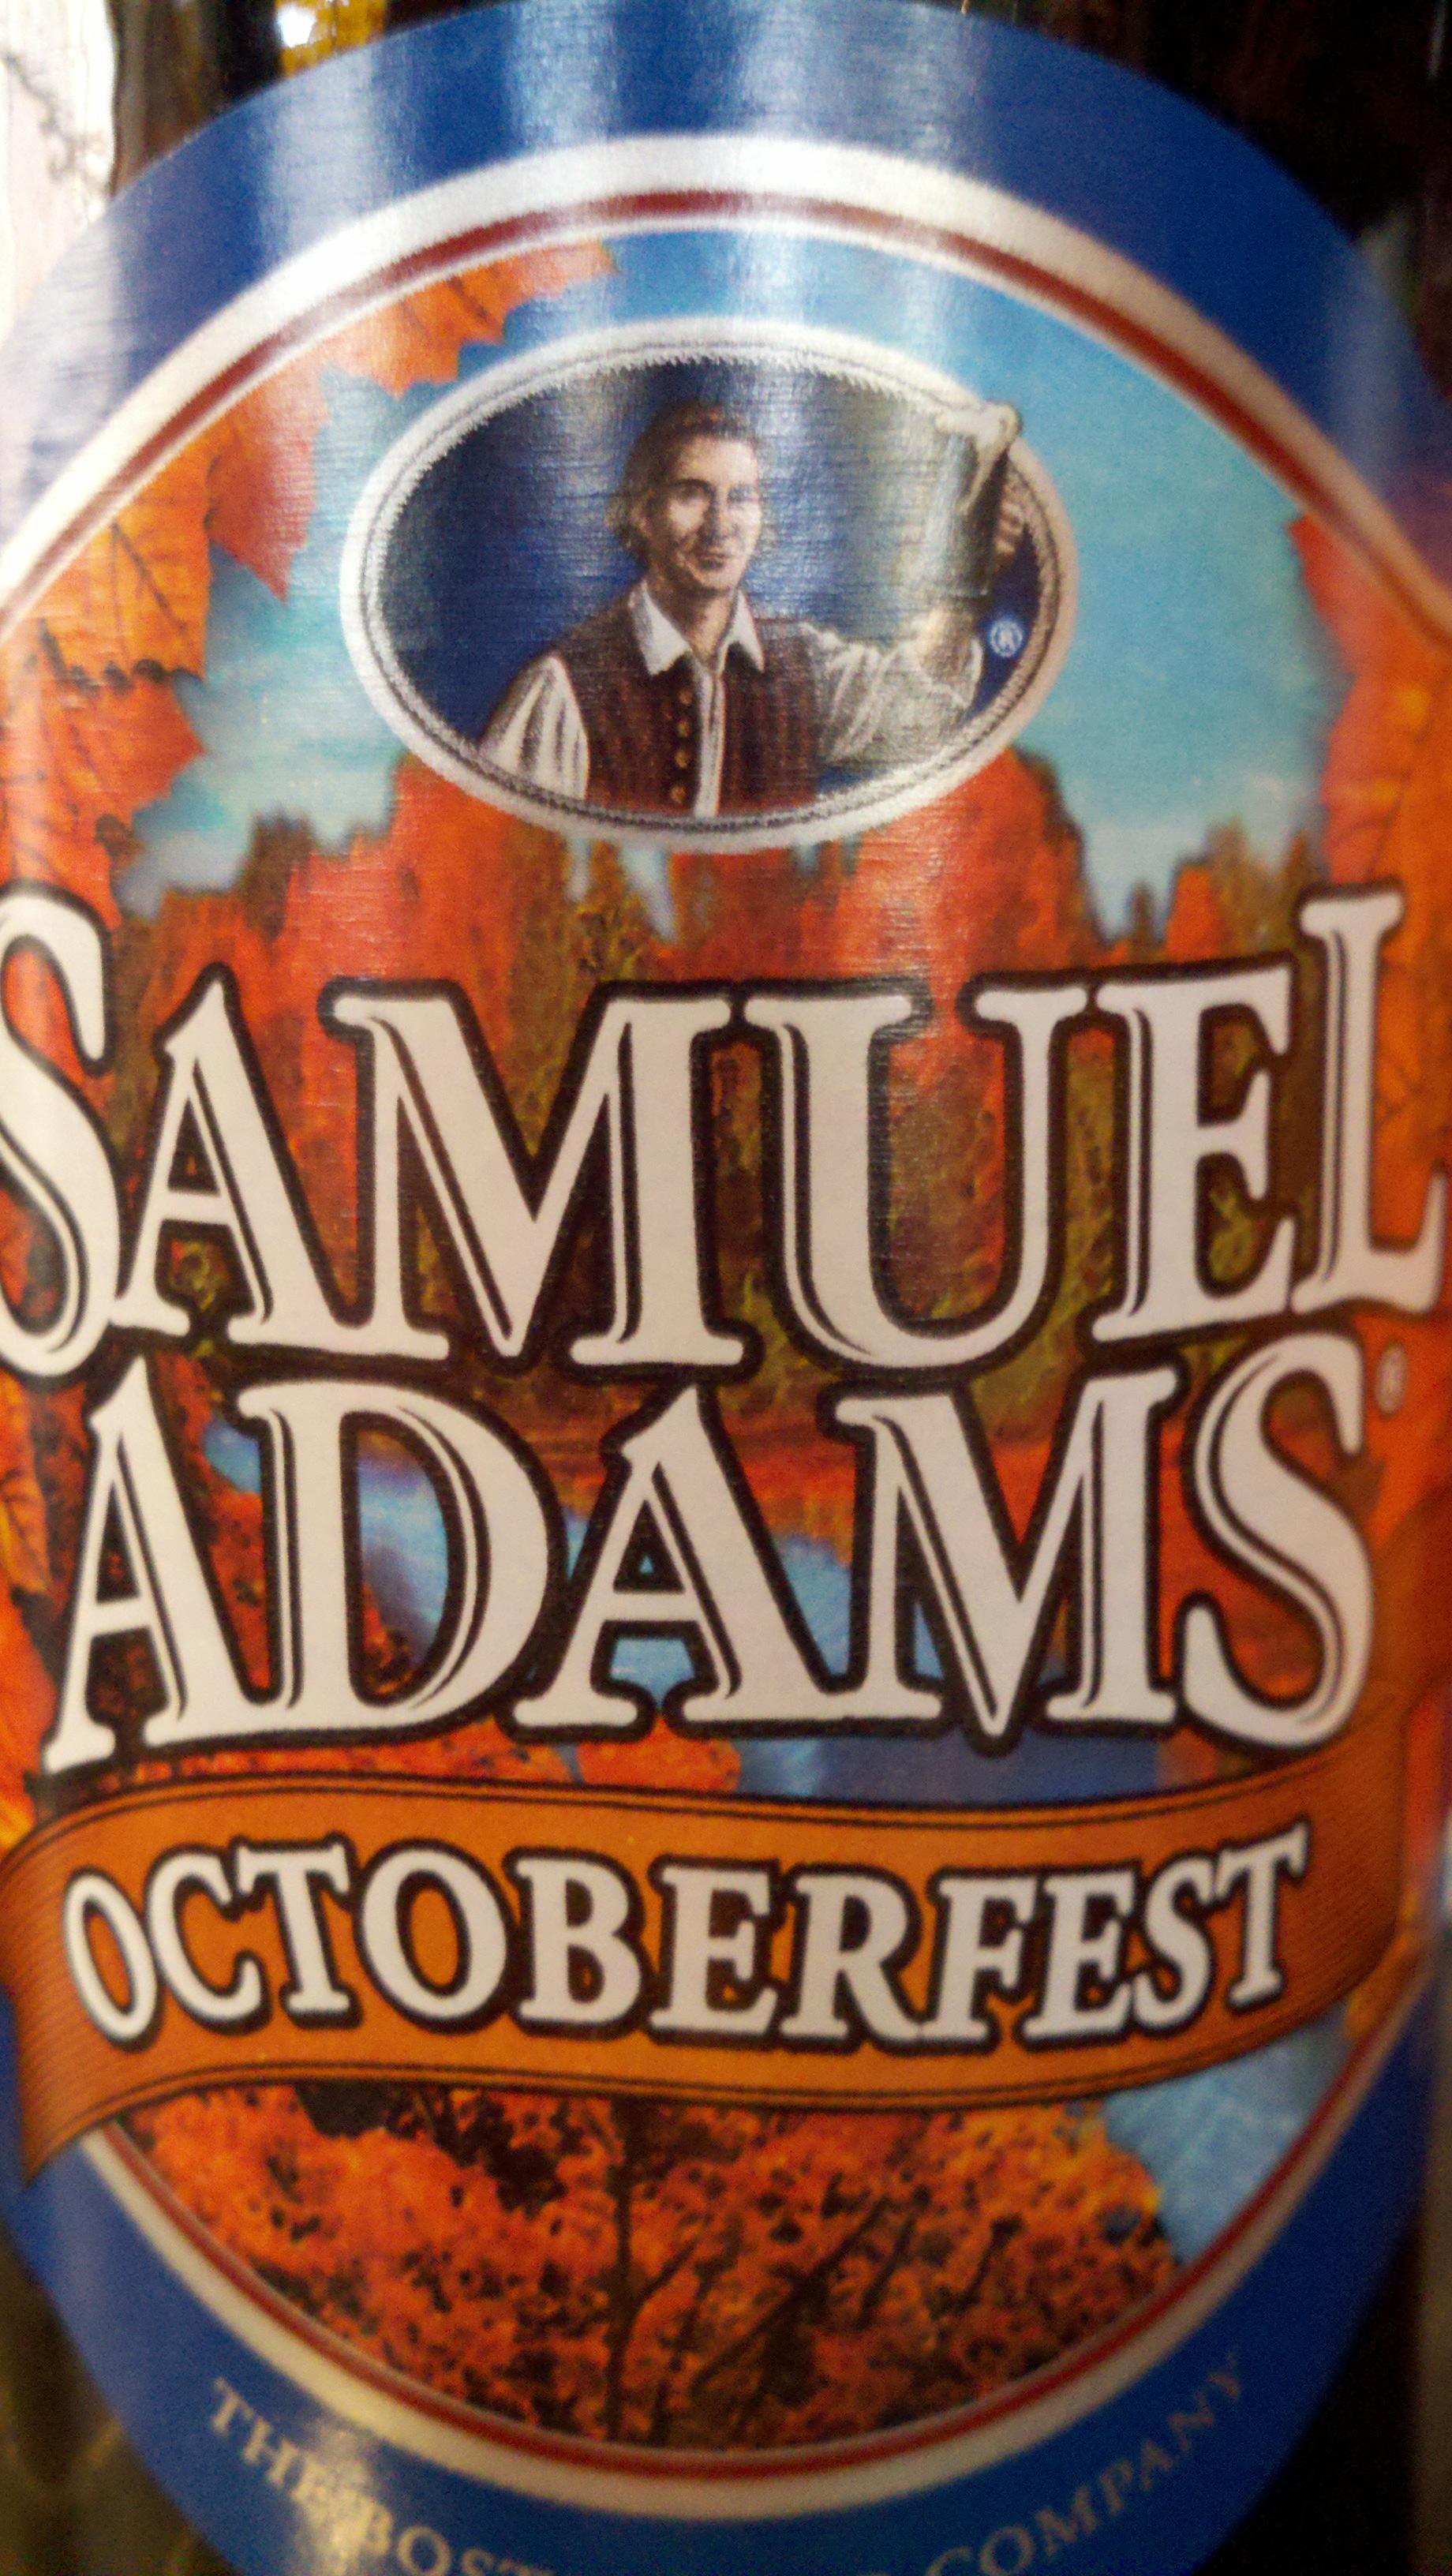 sam adams octoberfest percentage